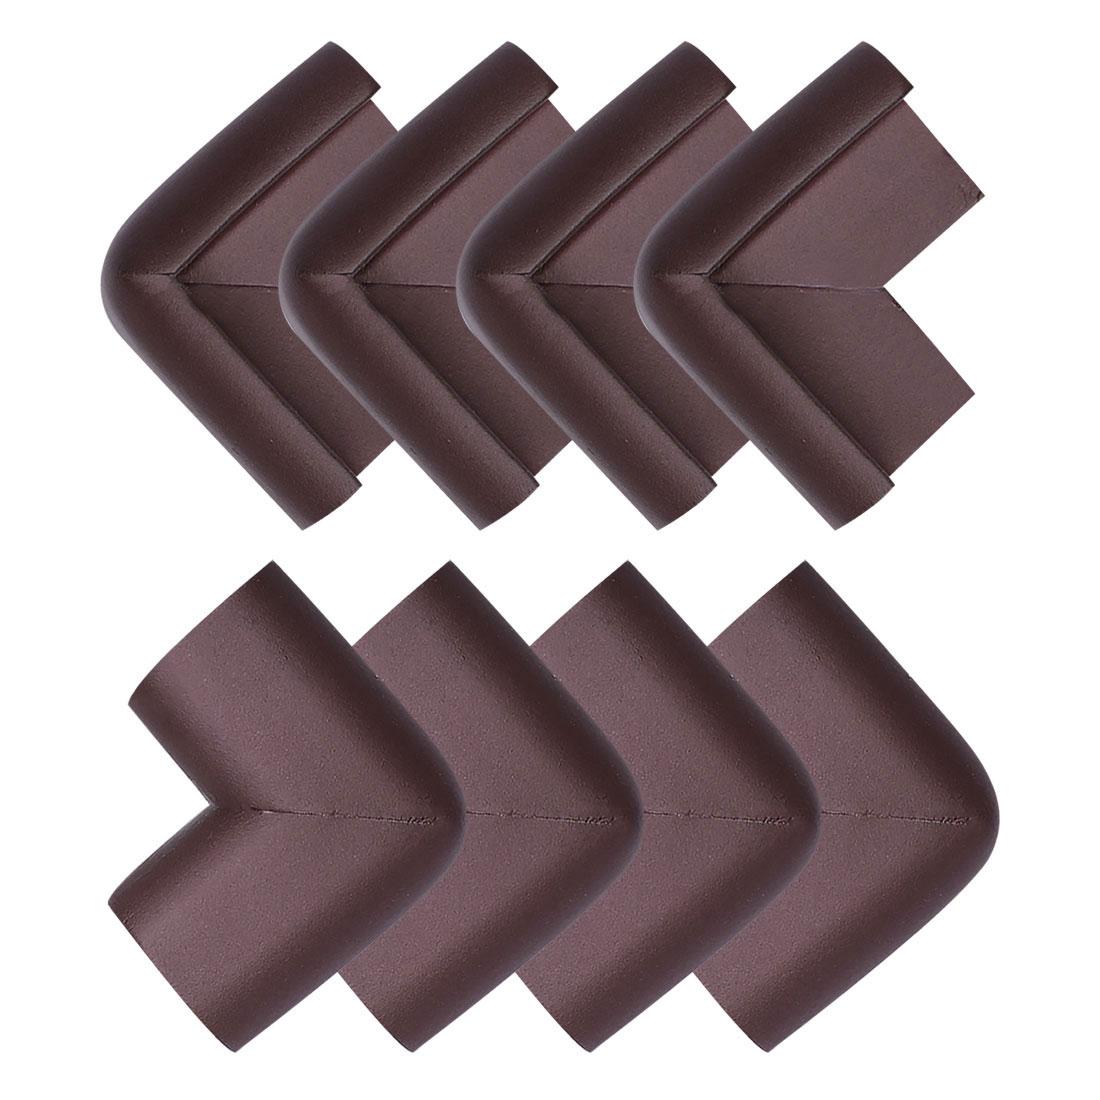 Edge Foam Corner Cushion Guard Strip Soft Bumper Protector 8pcs Dark Brown